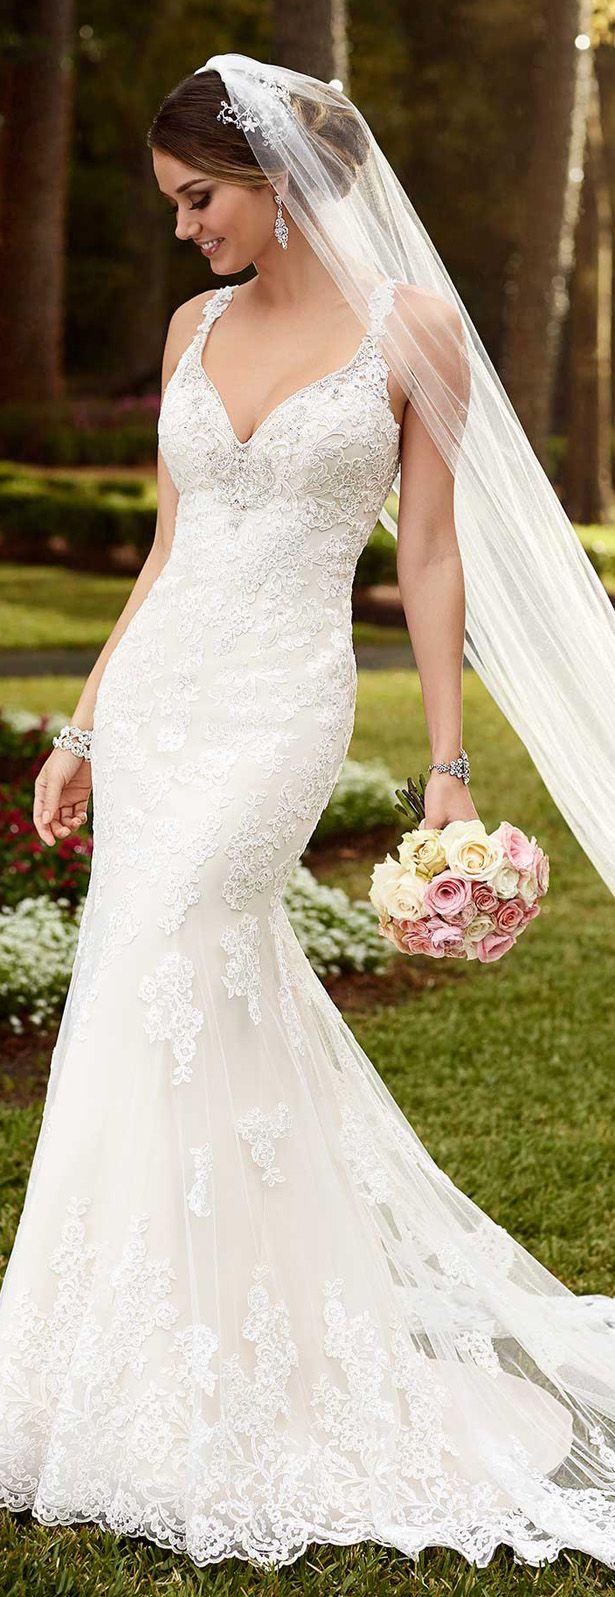 Big girl wedding dresses  Stella York  Idee per matrimoni  Pinterest  Stella york Wedding